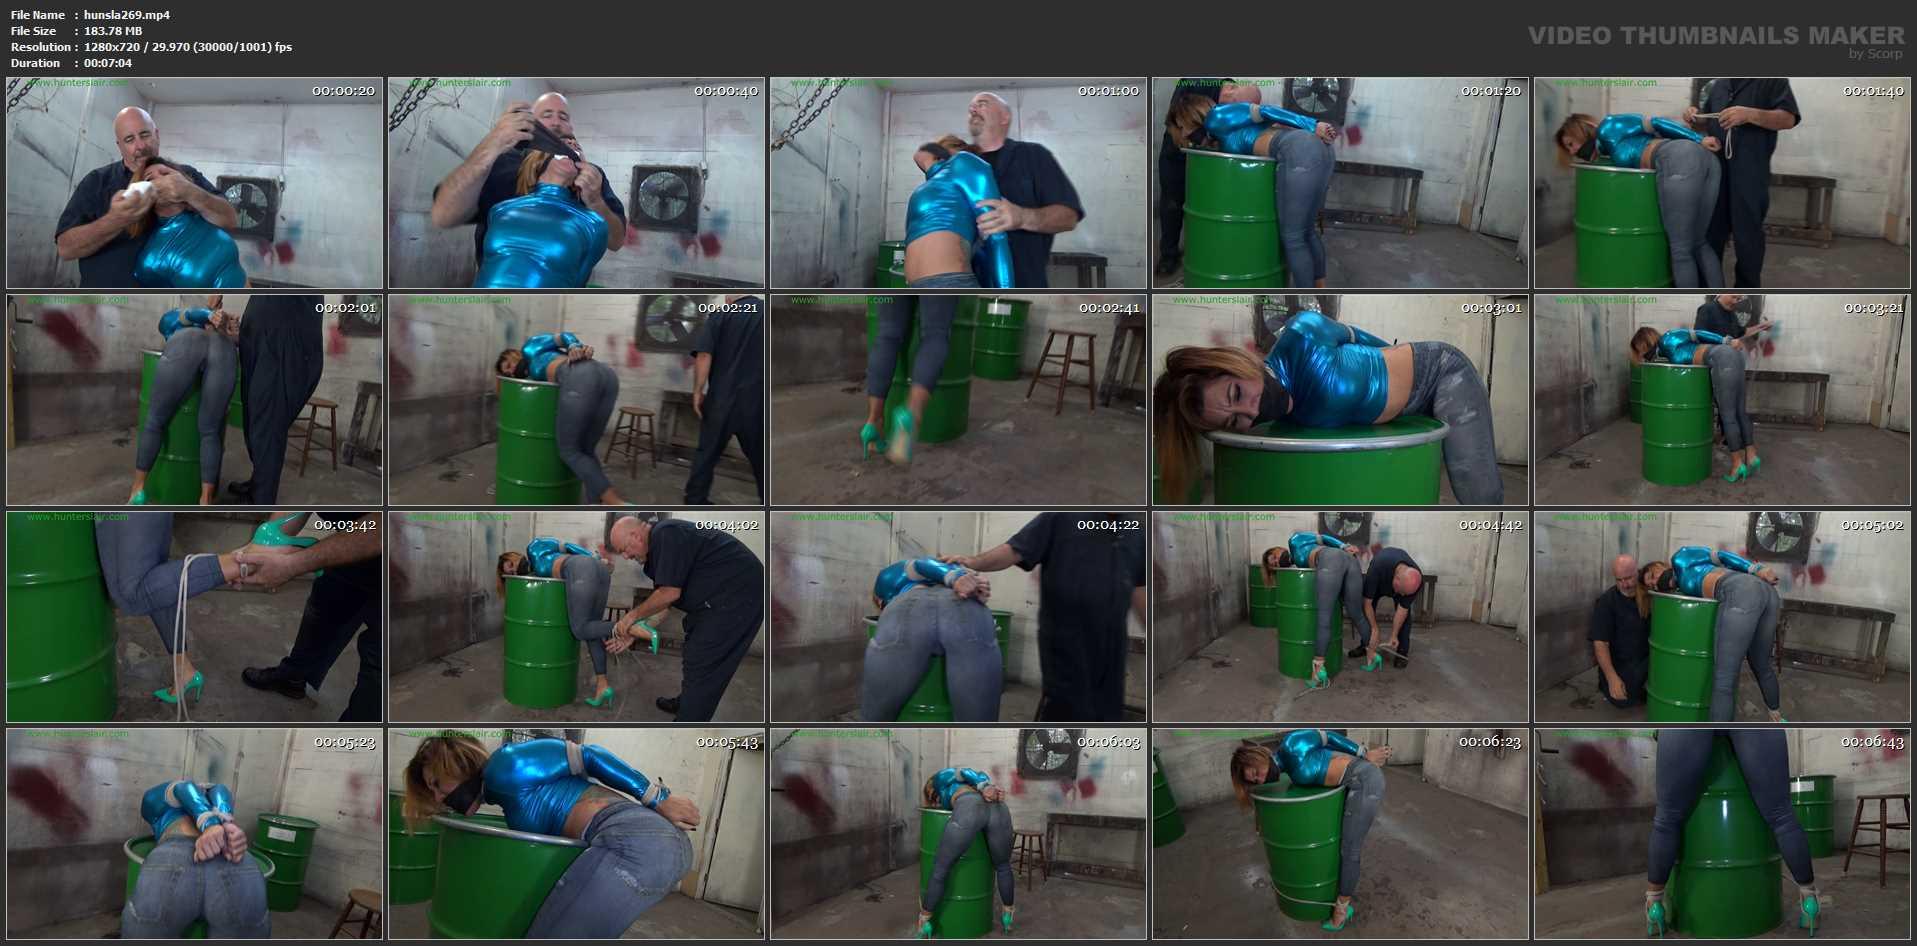 [HUNTERSLAIR] Hot booty Latina bound over a barrel. Featuring: Sahrye [HD][720p][MP4]